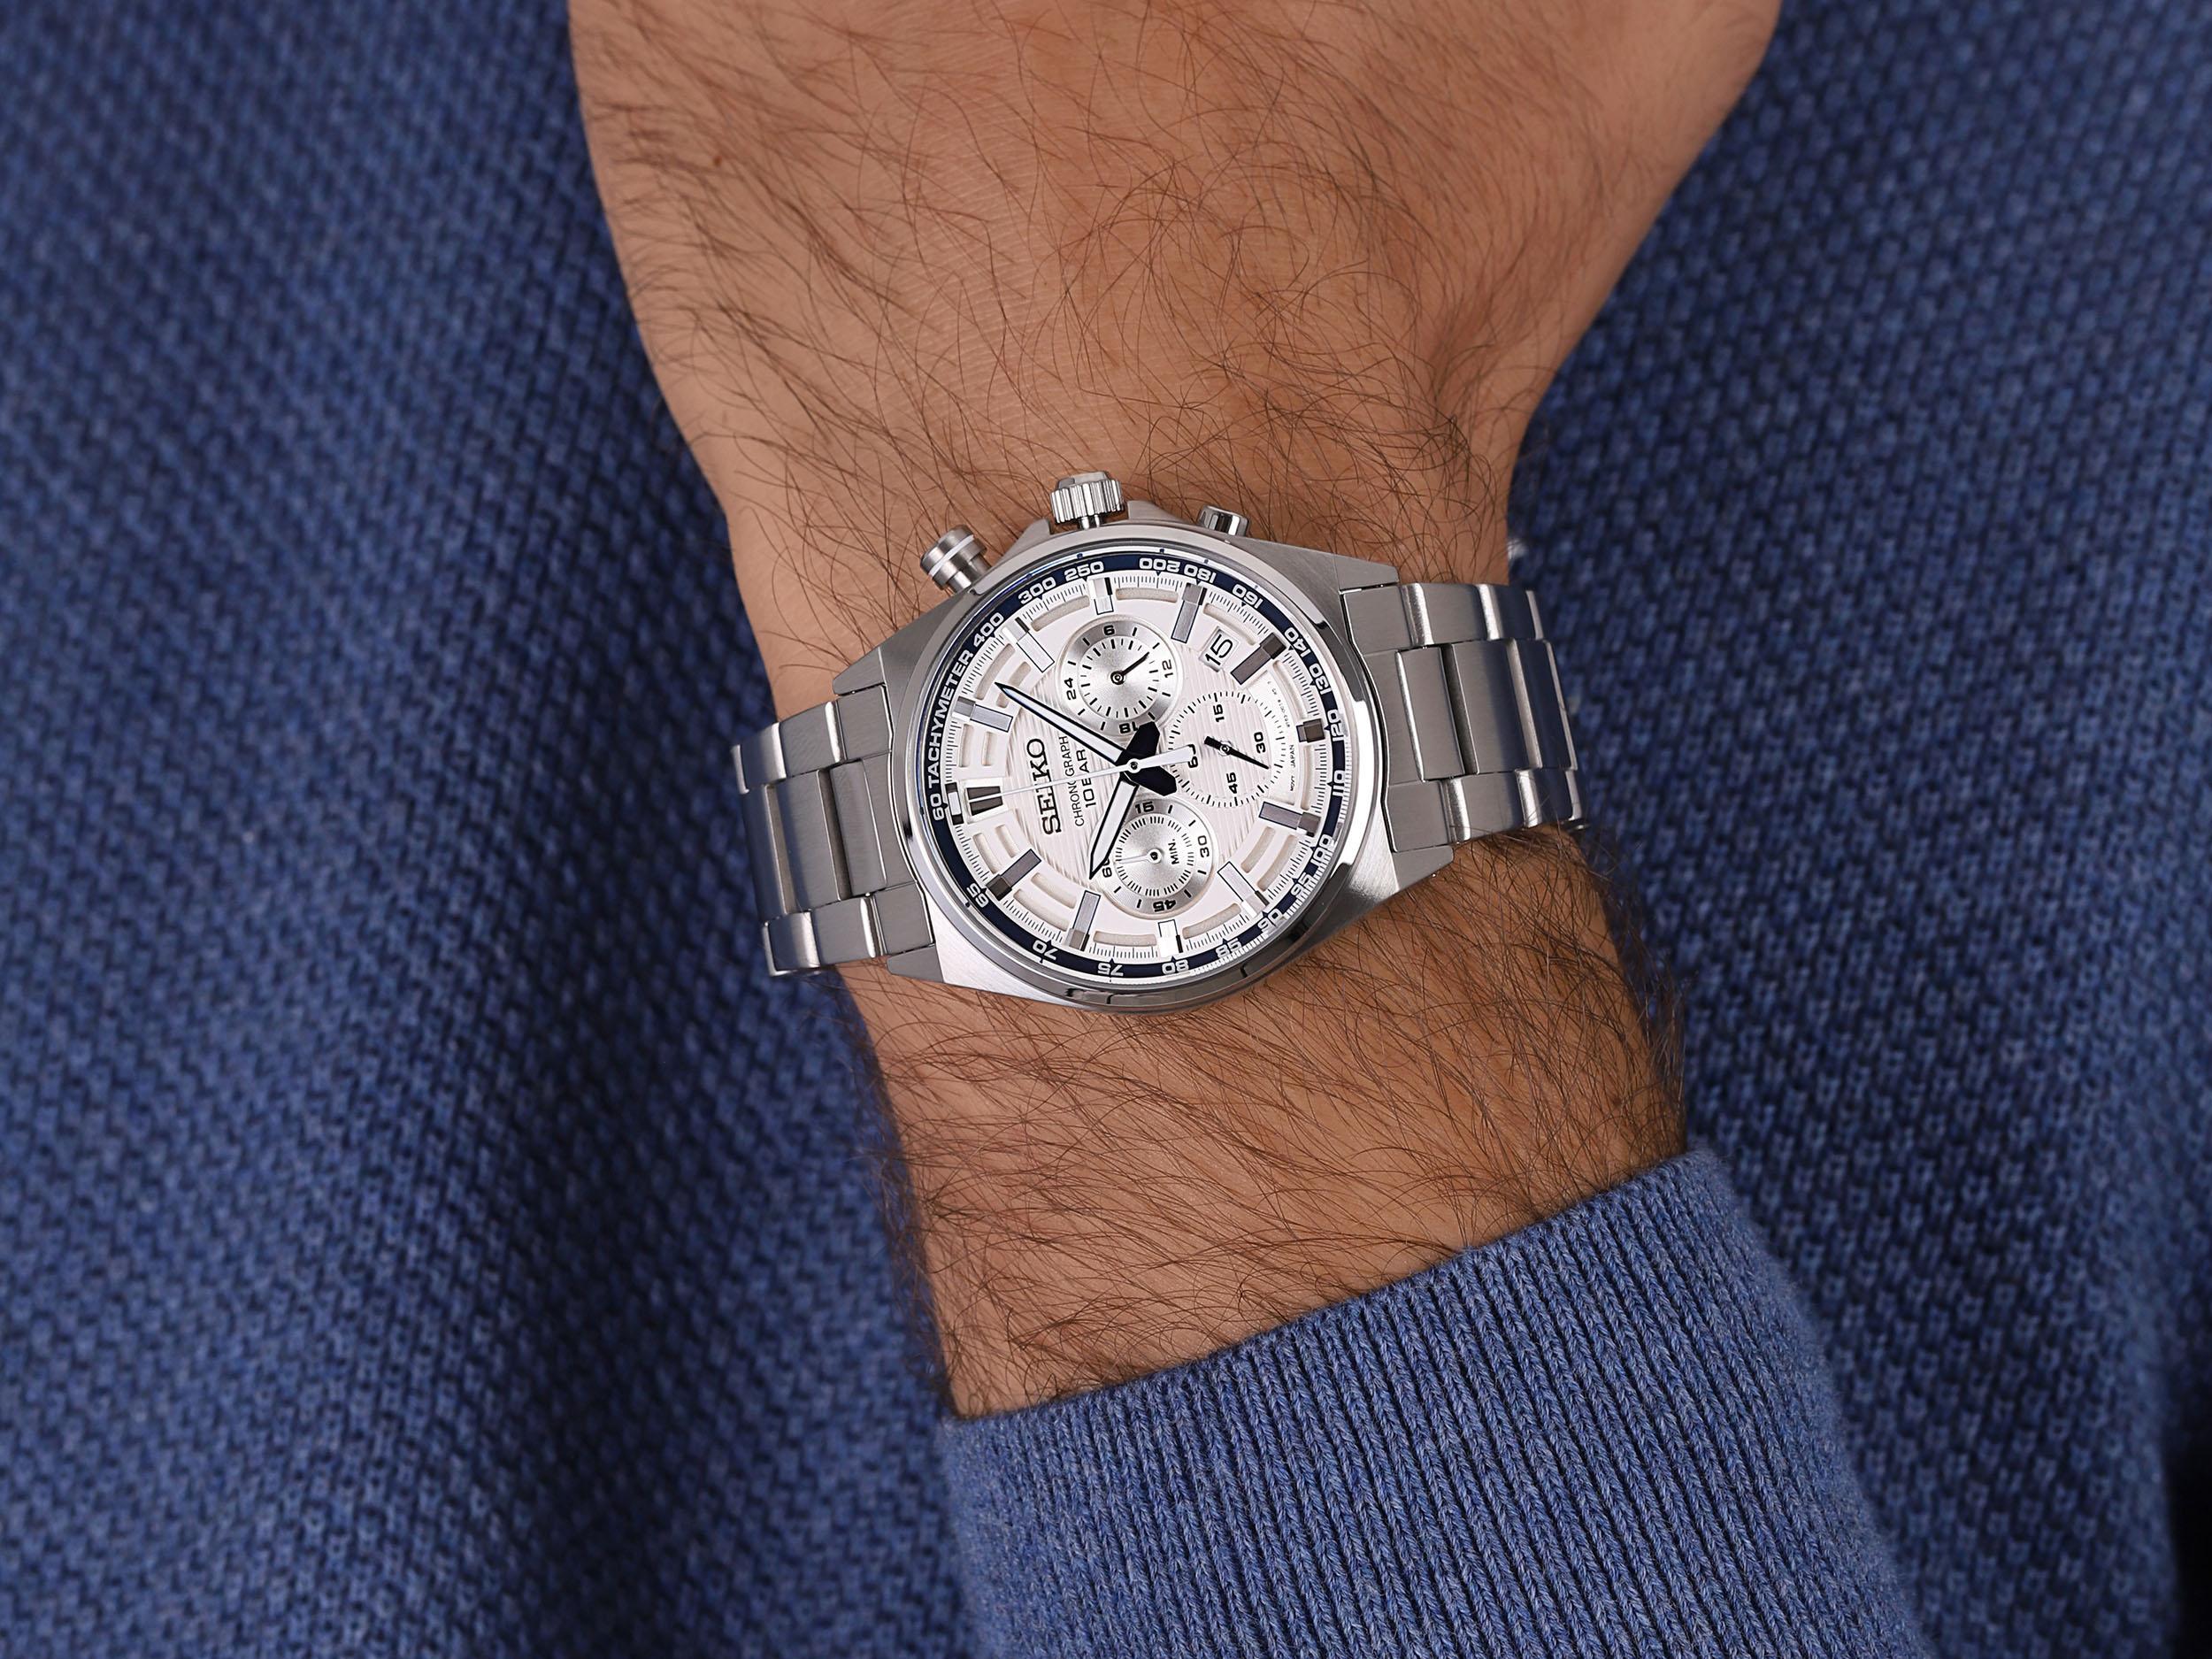 zegarek Seiko SSB395P1 Chronograph Quartz 100m męski z tachometr Chronograph